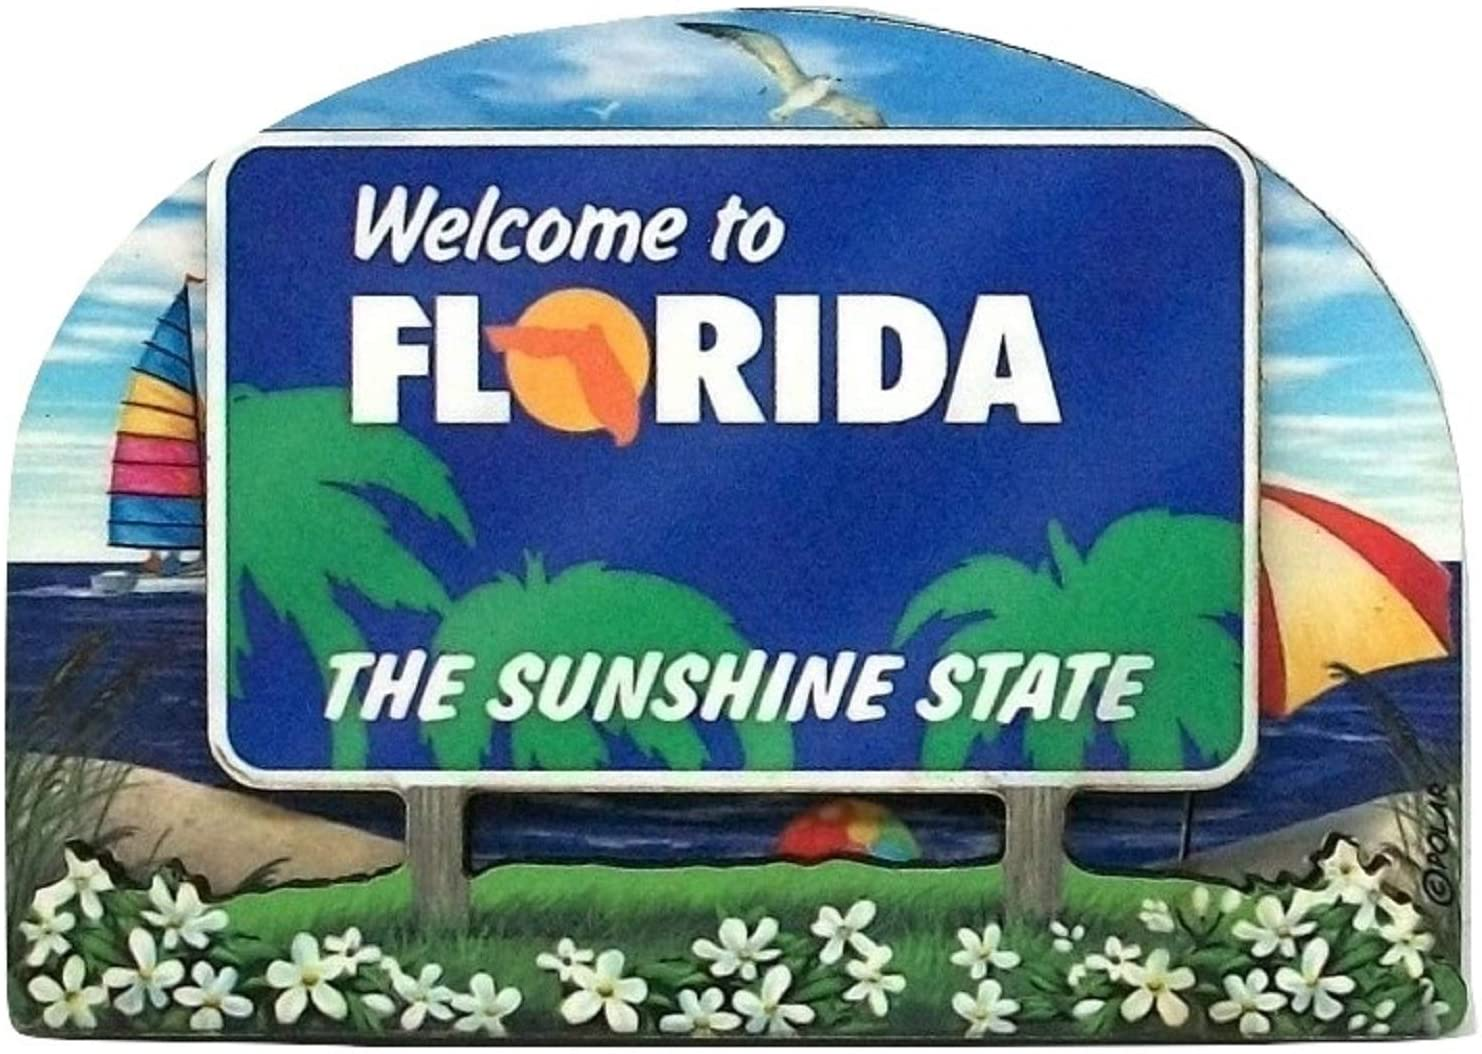 Florida tourism with blackbird